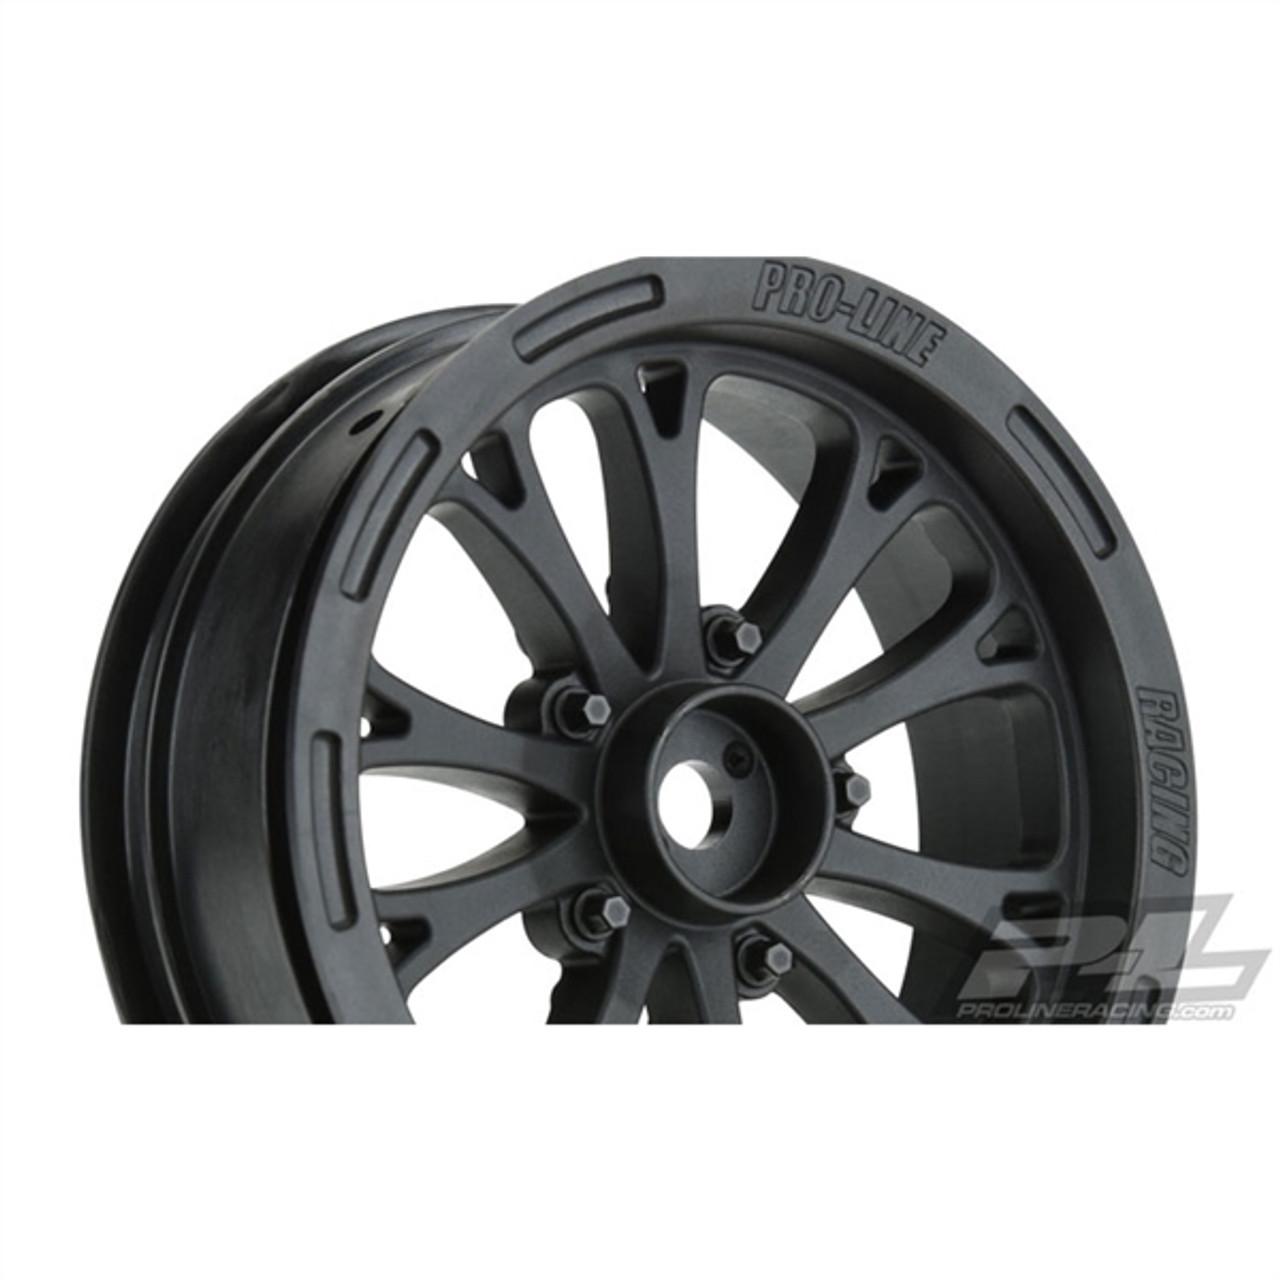 Black Pro-line Racing Pomona Drag Spec 2.2 Slash Front PRO277503